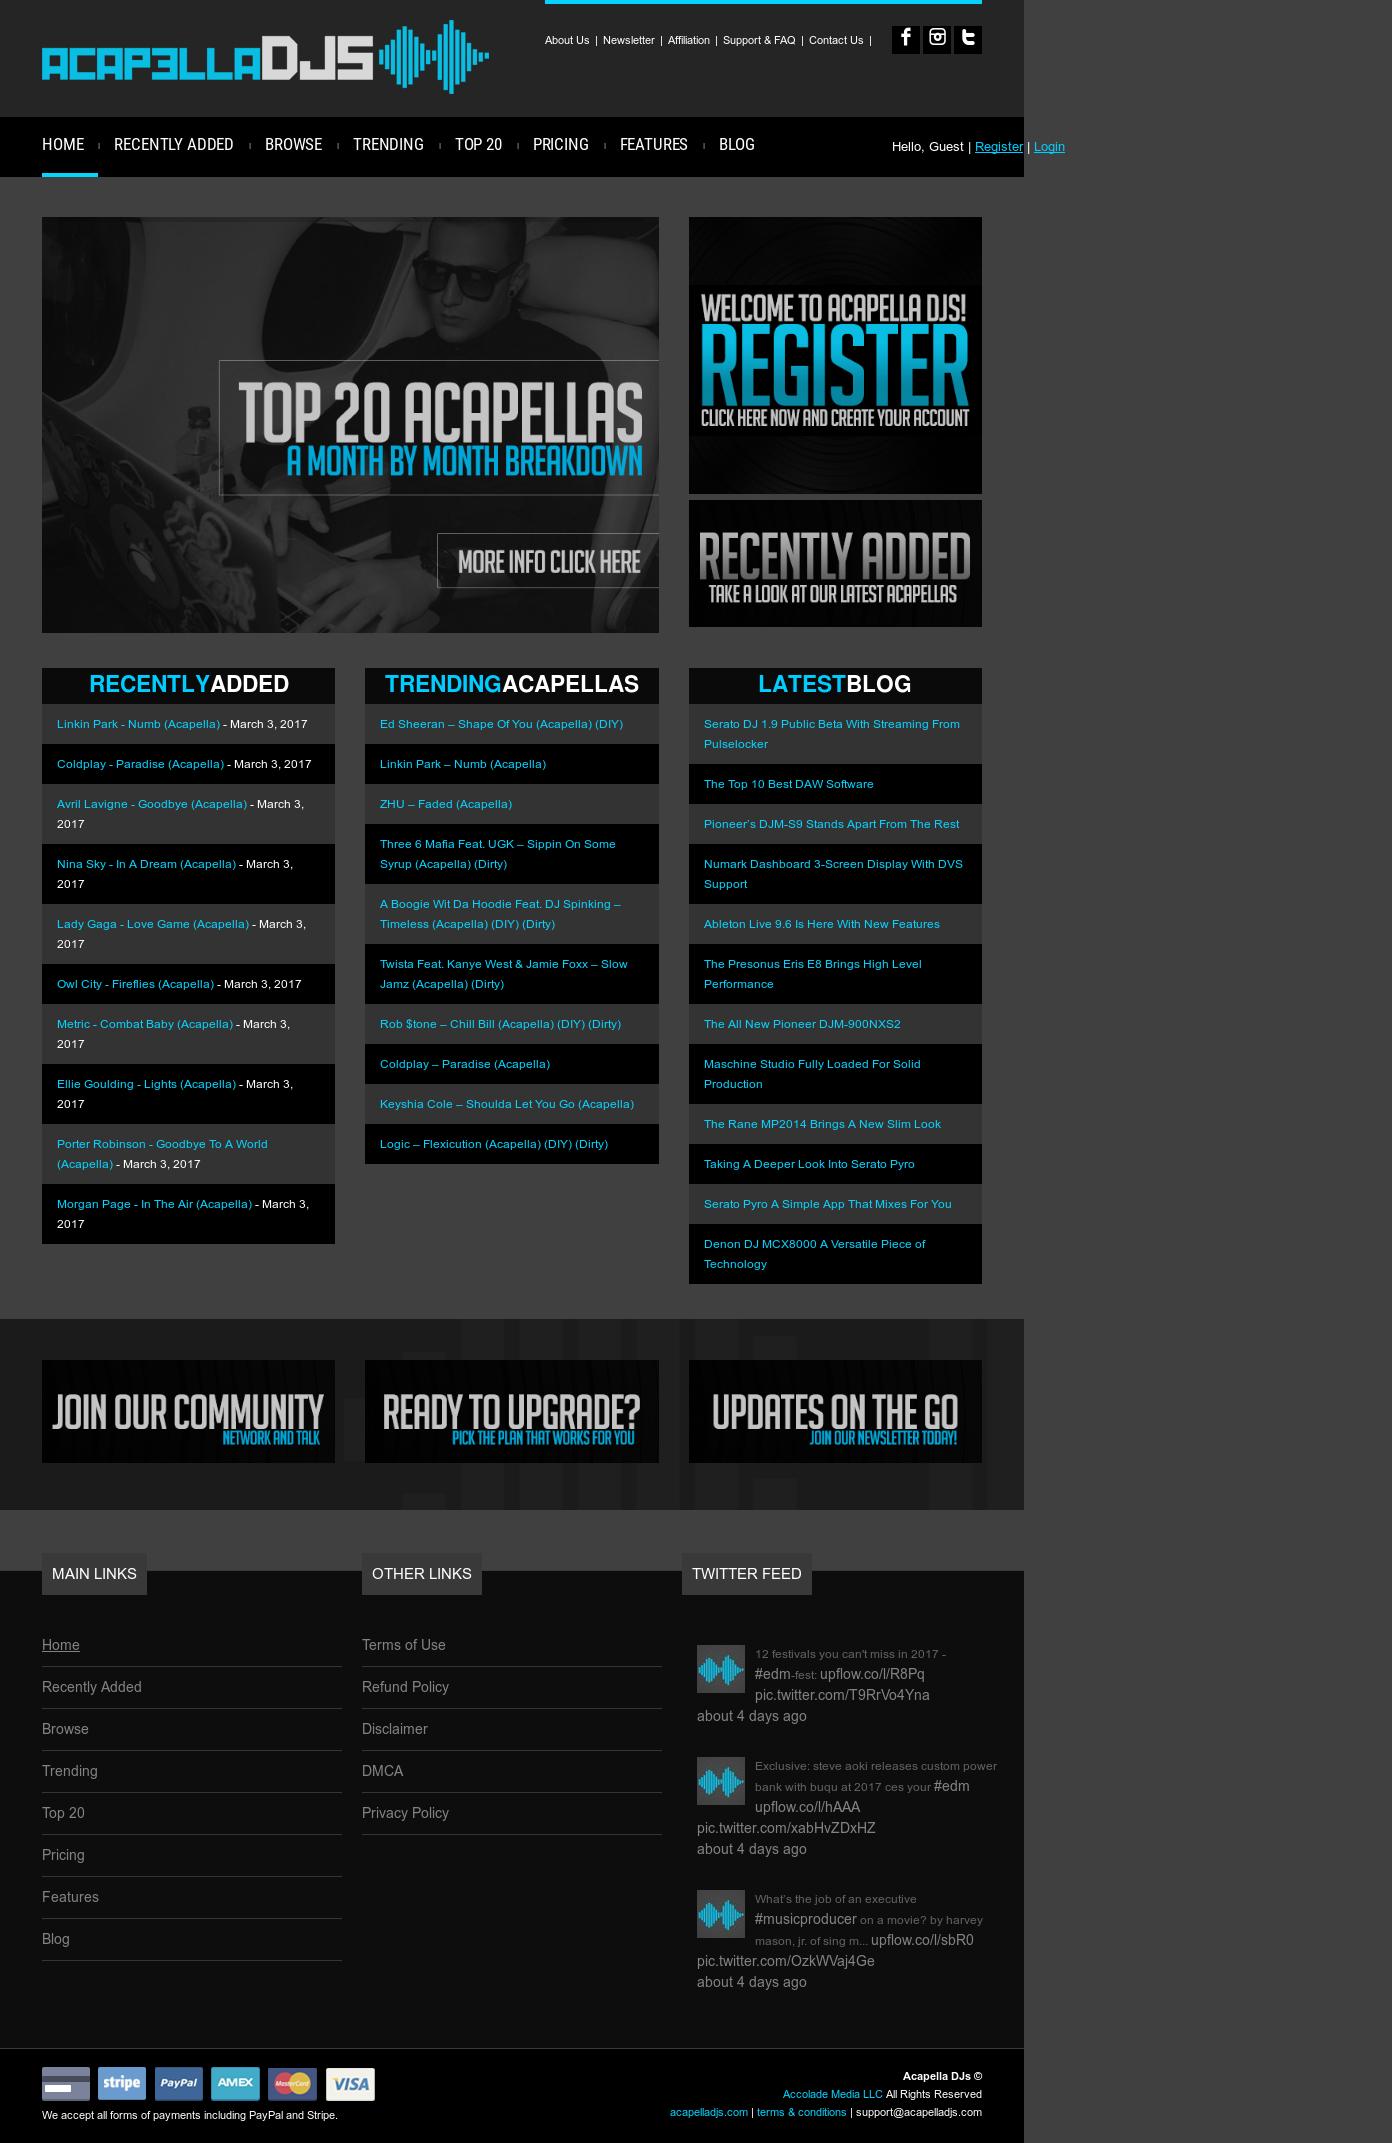 Acapella Djs Competitors, Revenue and Employees - Owler